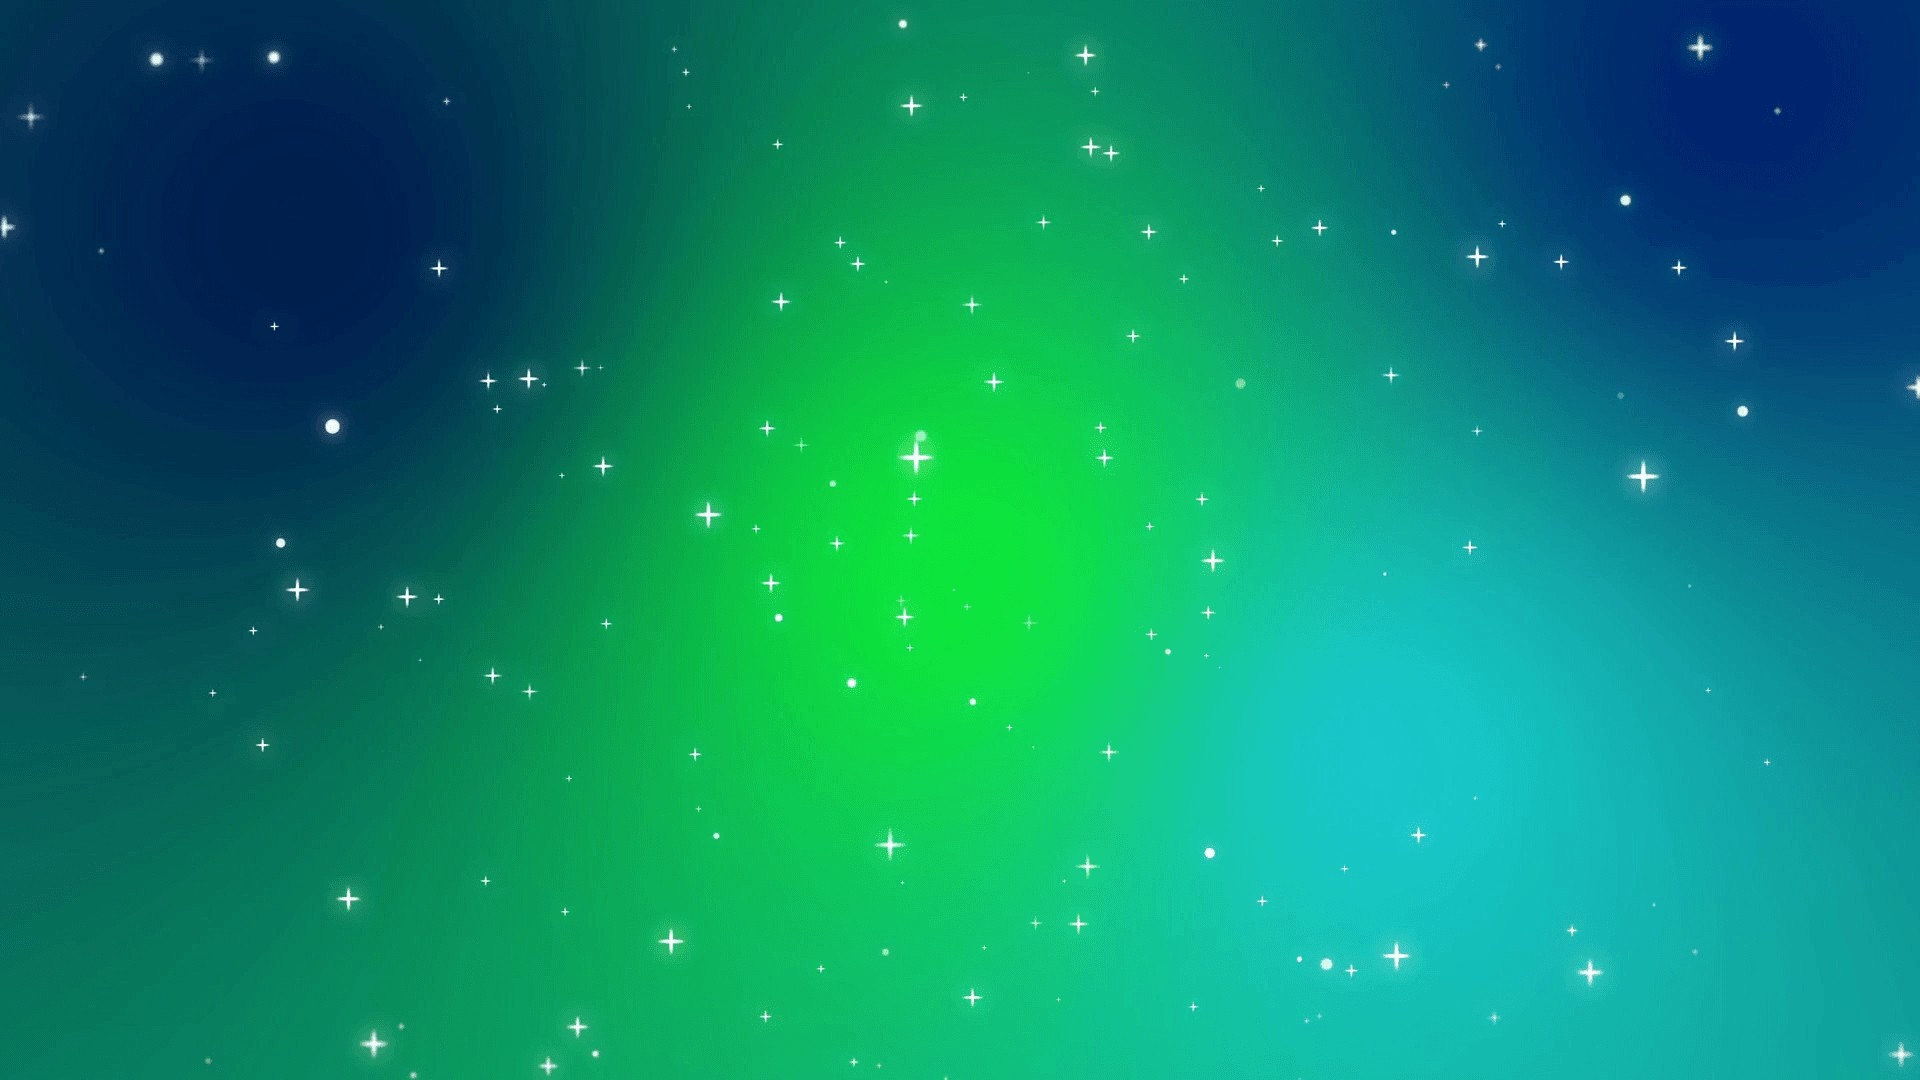 Spark Green Desktop Wallpaper